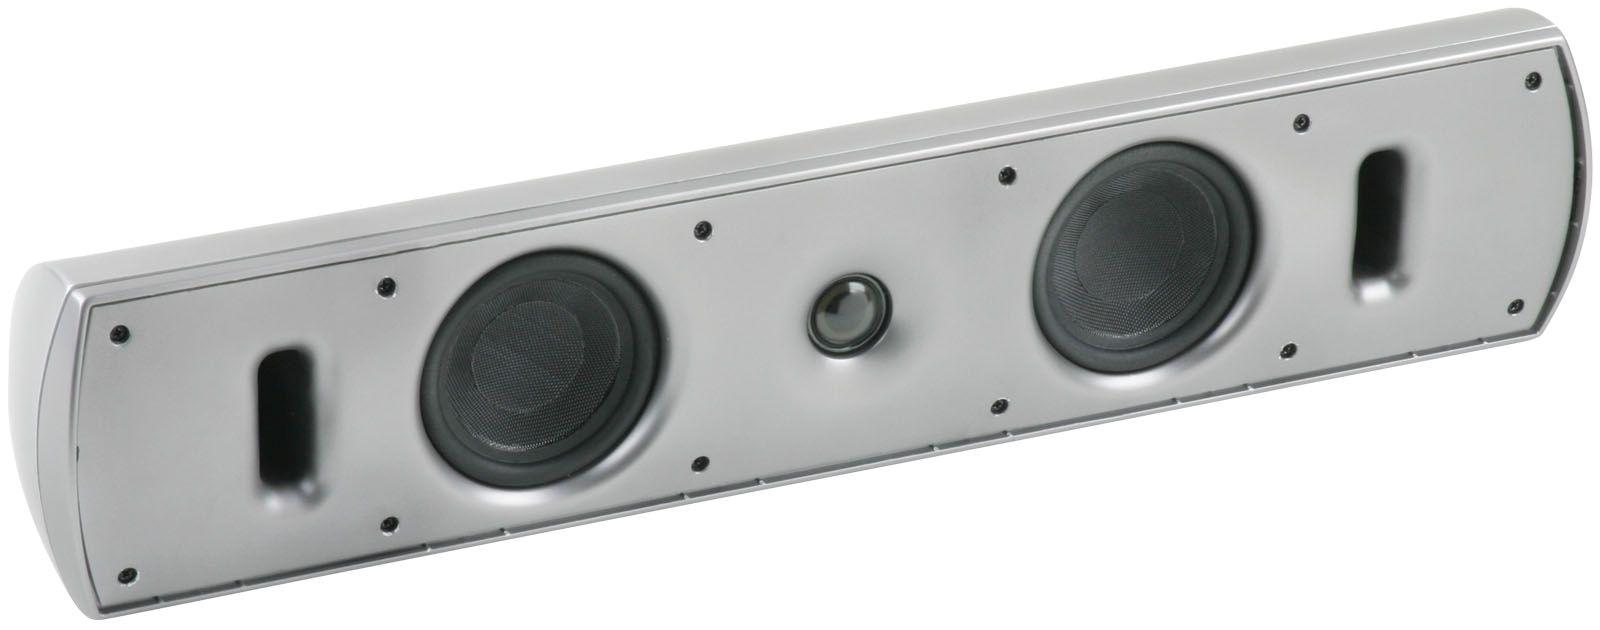 Mpp4200 Dual 4 8 Ohm Surface Mount Multipurpose Speaker Mtx Audio 100w Car Subwoofer Amplifier Serious About Sound